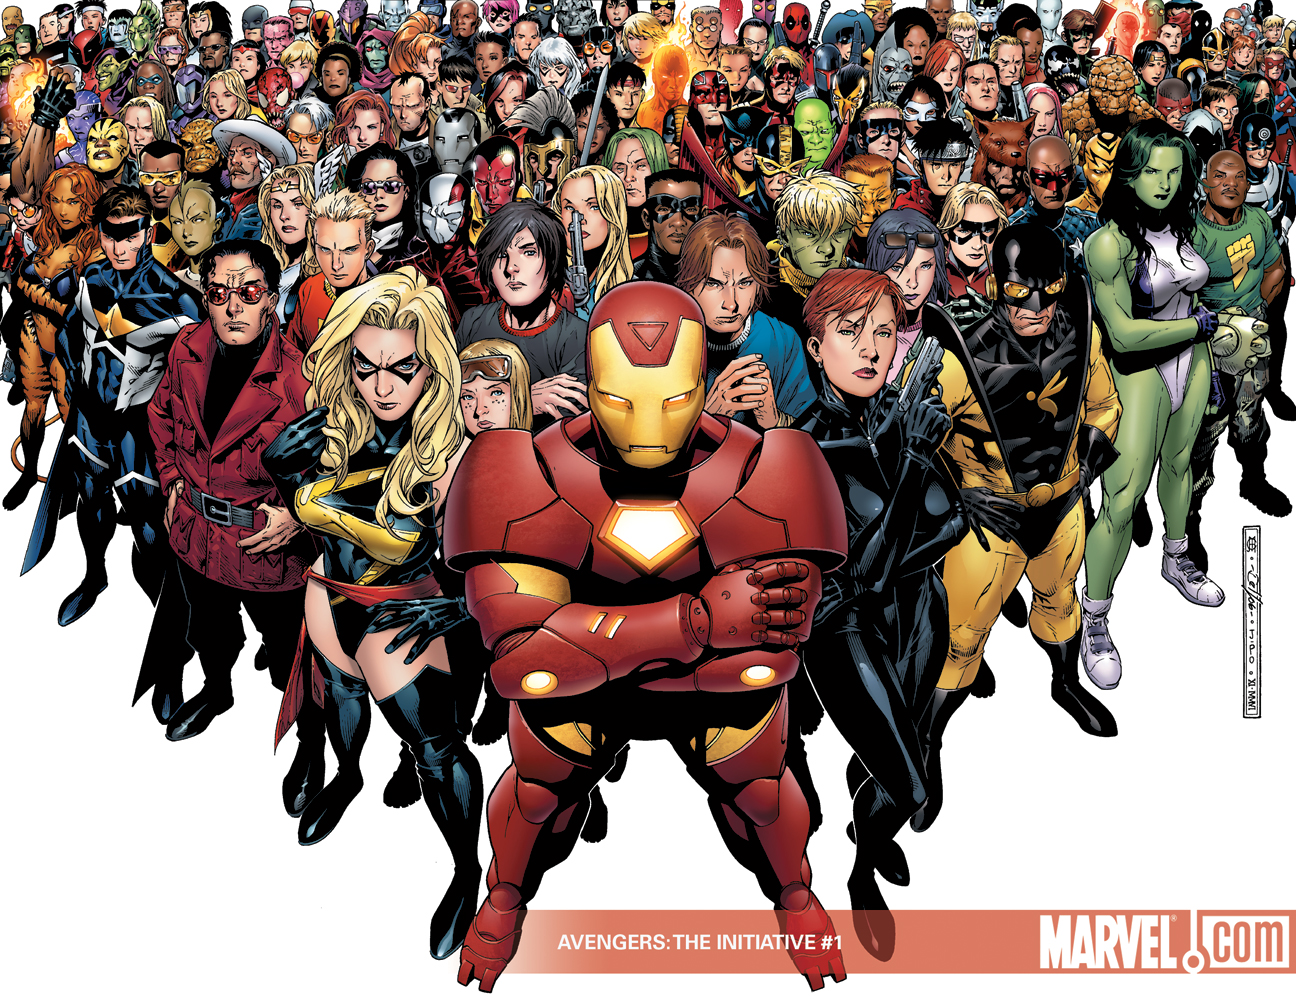 Marvel Comics HD Desktop Wallpapers Download Wallpapers in HD for 1296x1002